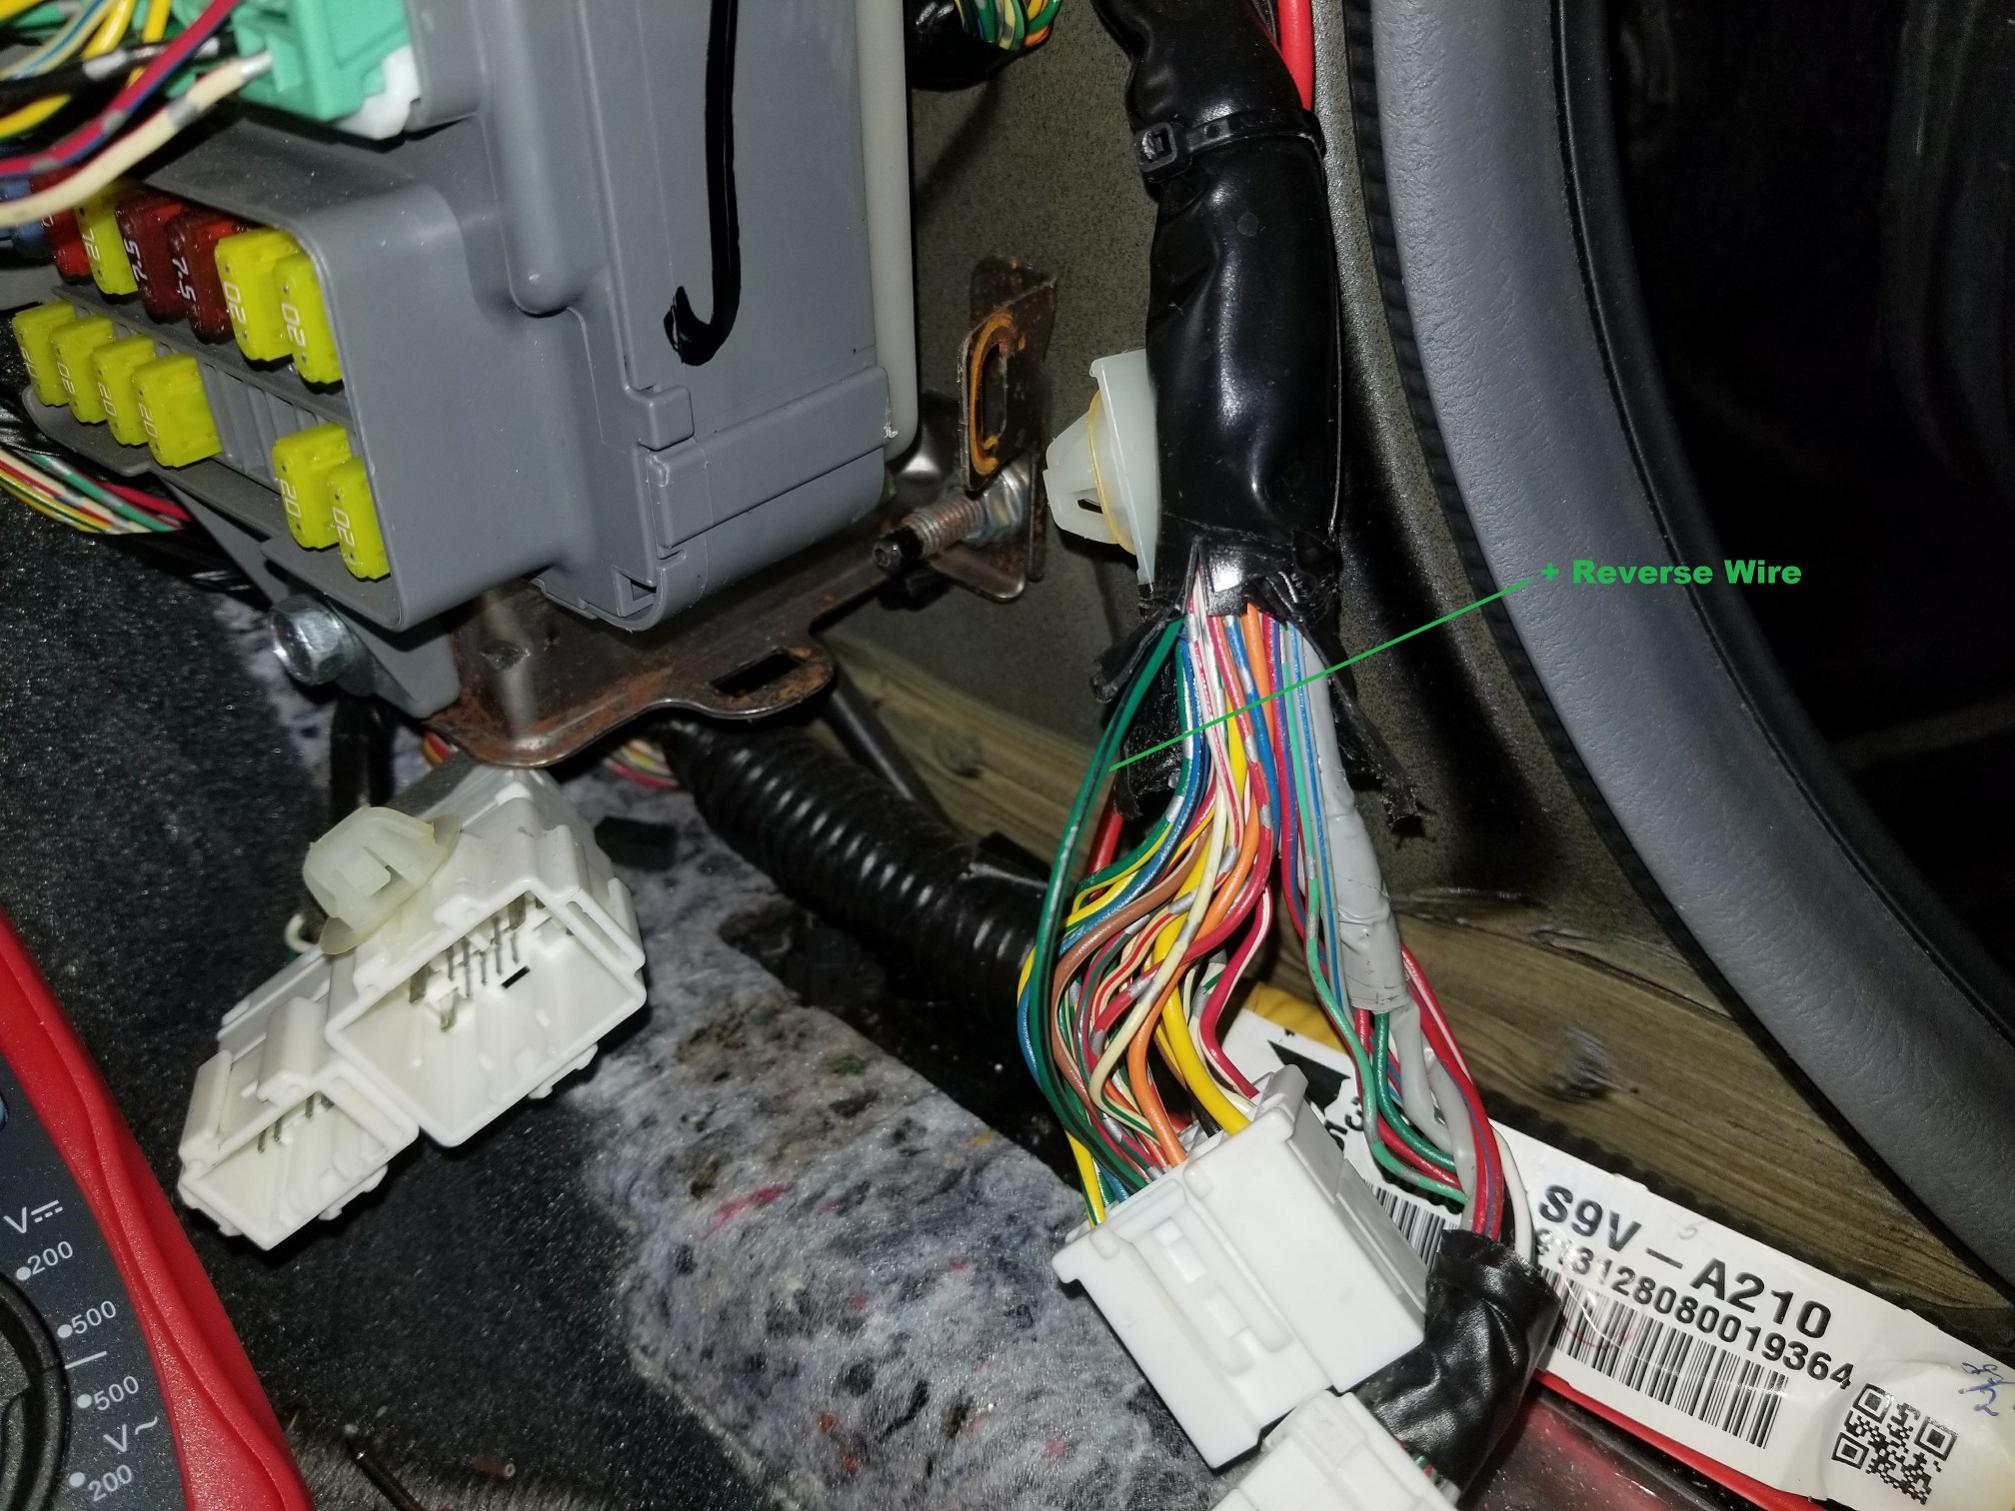 06-08 Honda Pilot Reverse Wire | Honda Pilot - Honda Pilot ForumsHonda Pilot